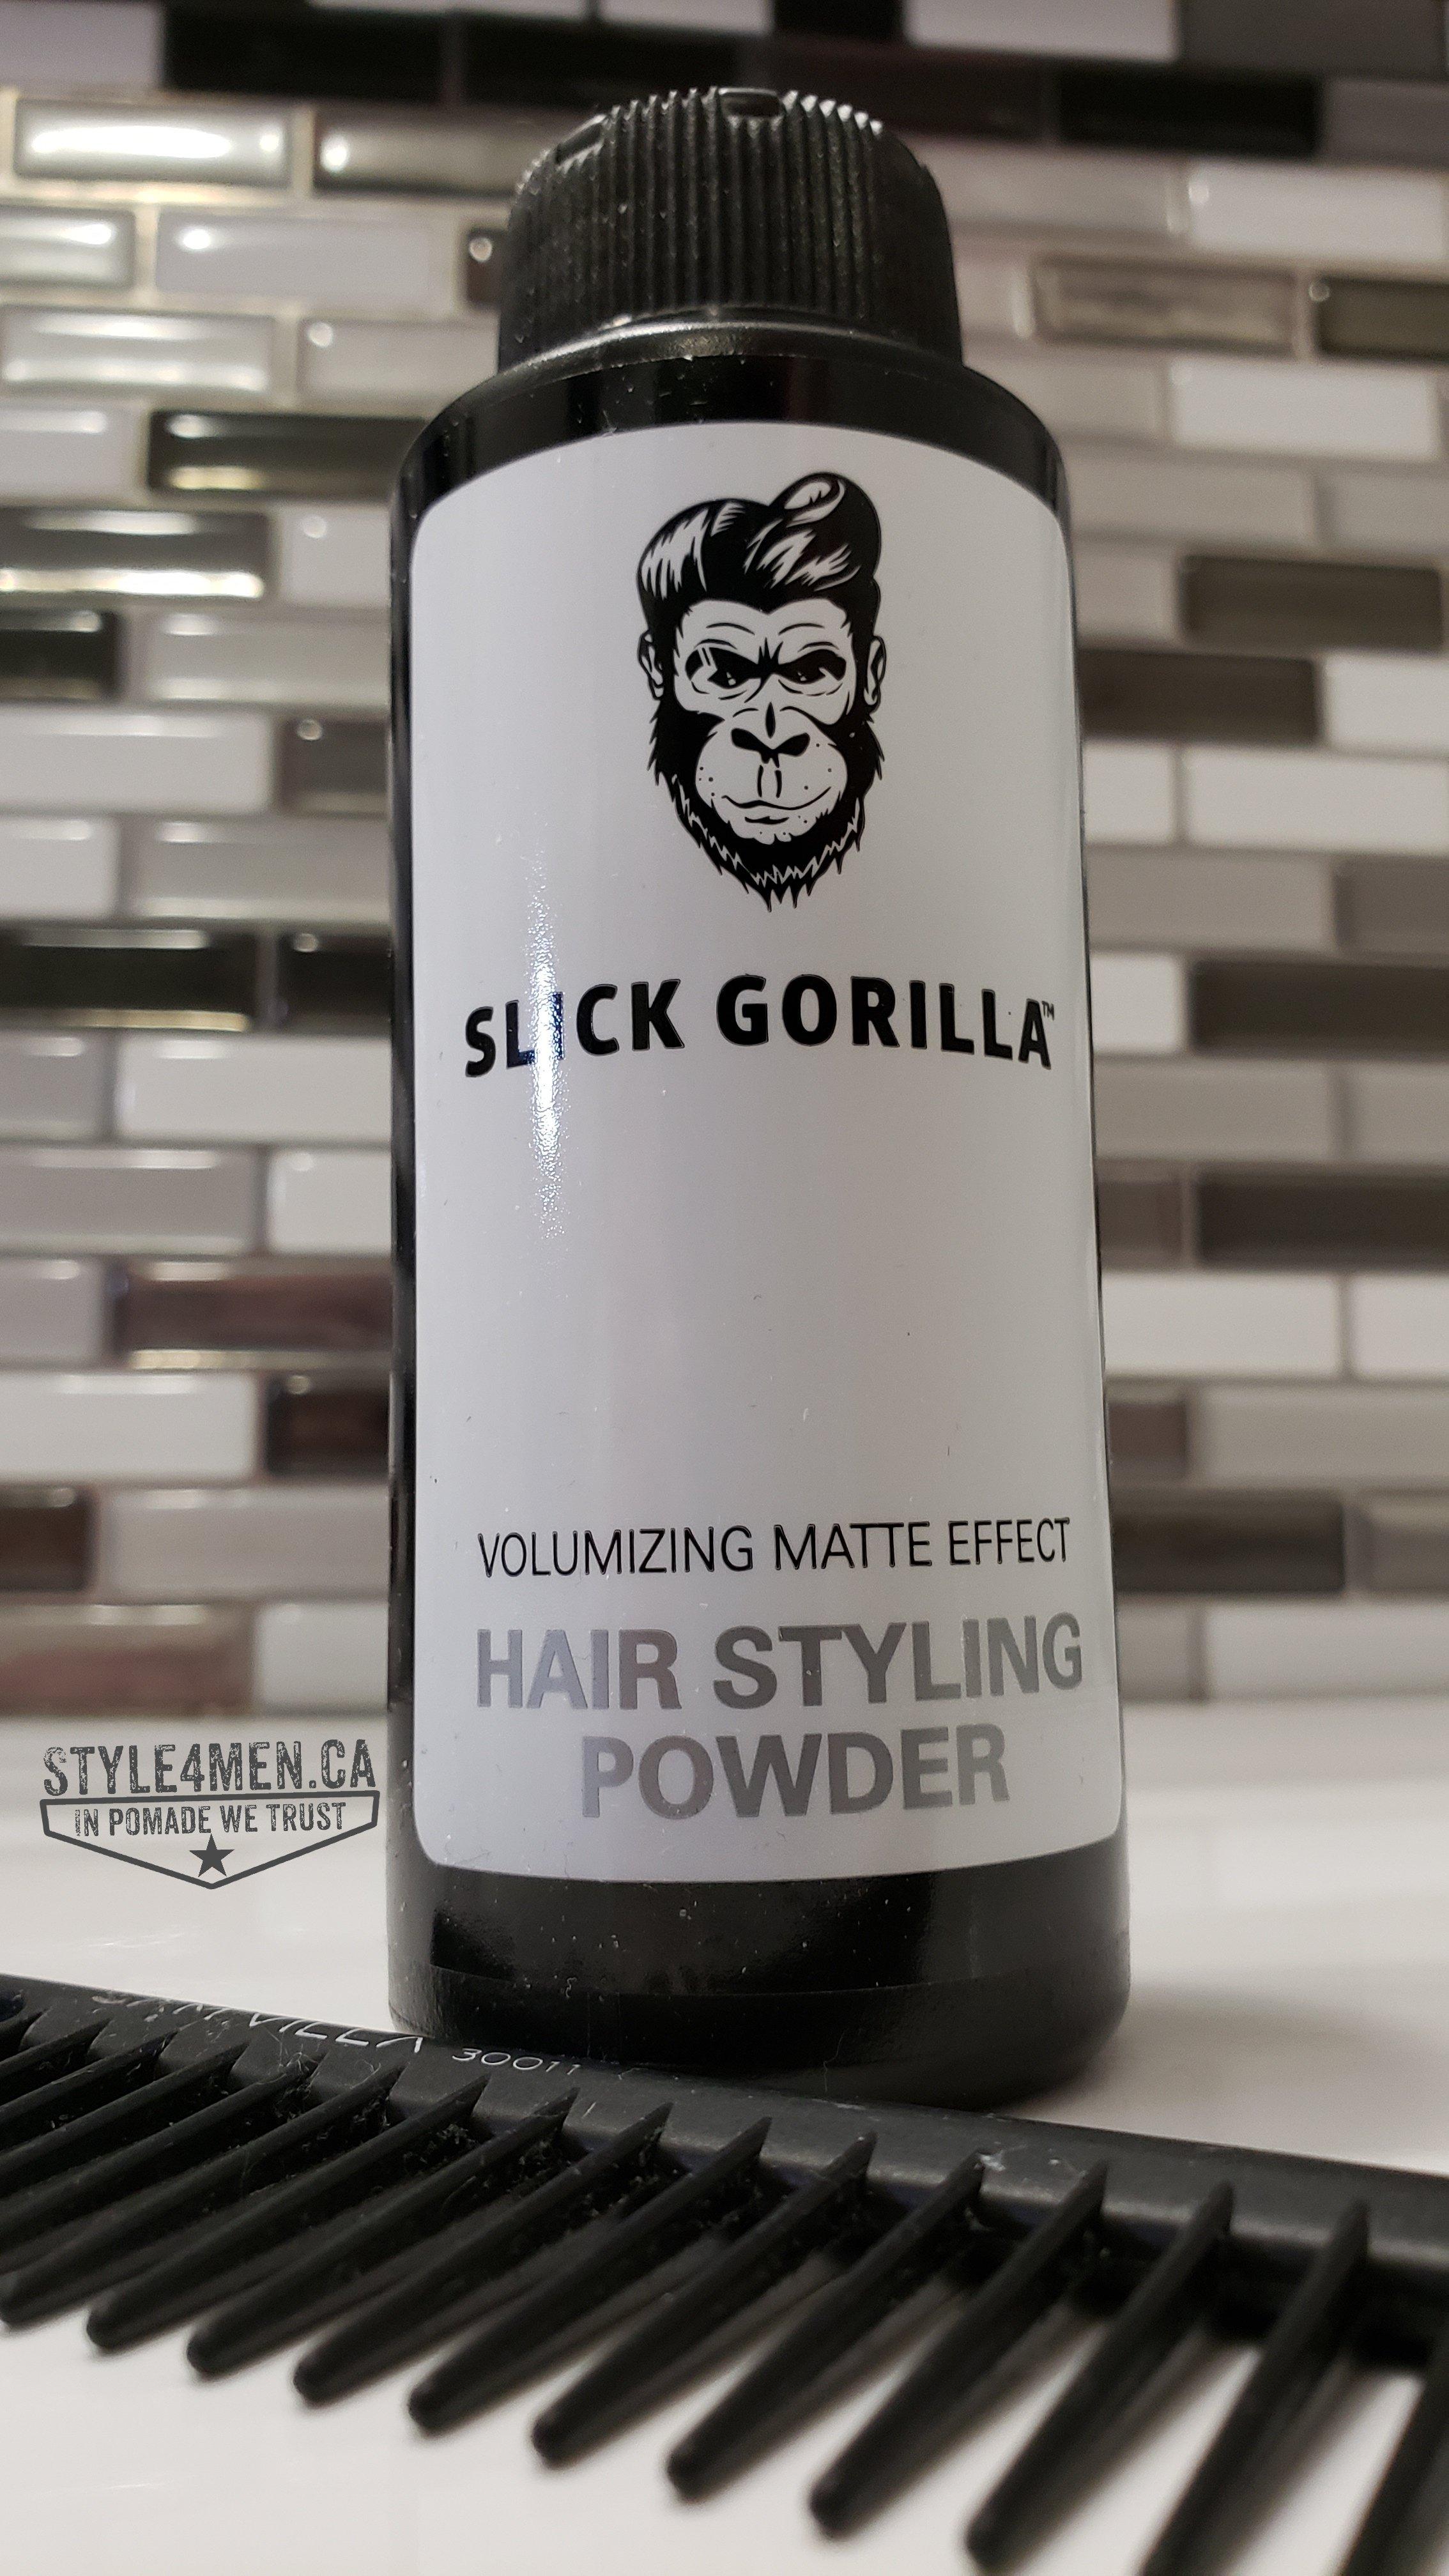 Hair Styling Powder by Slick Gorilla